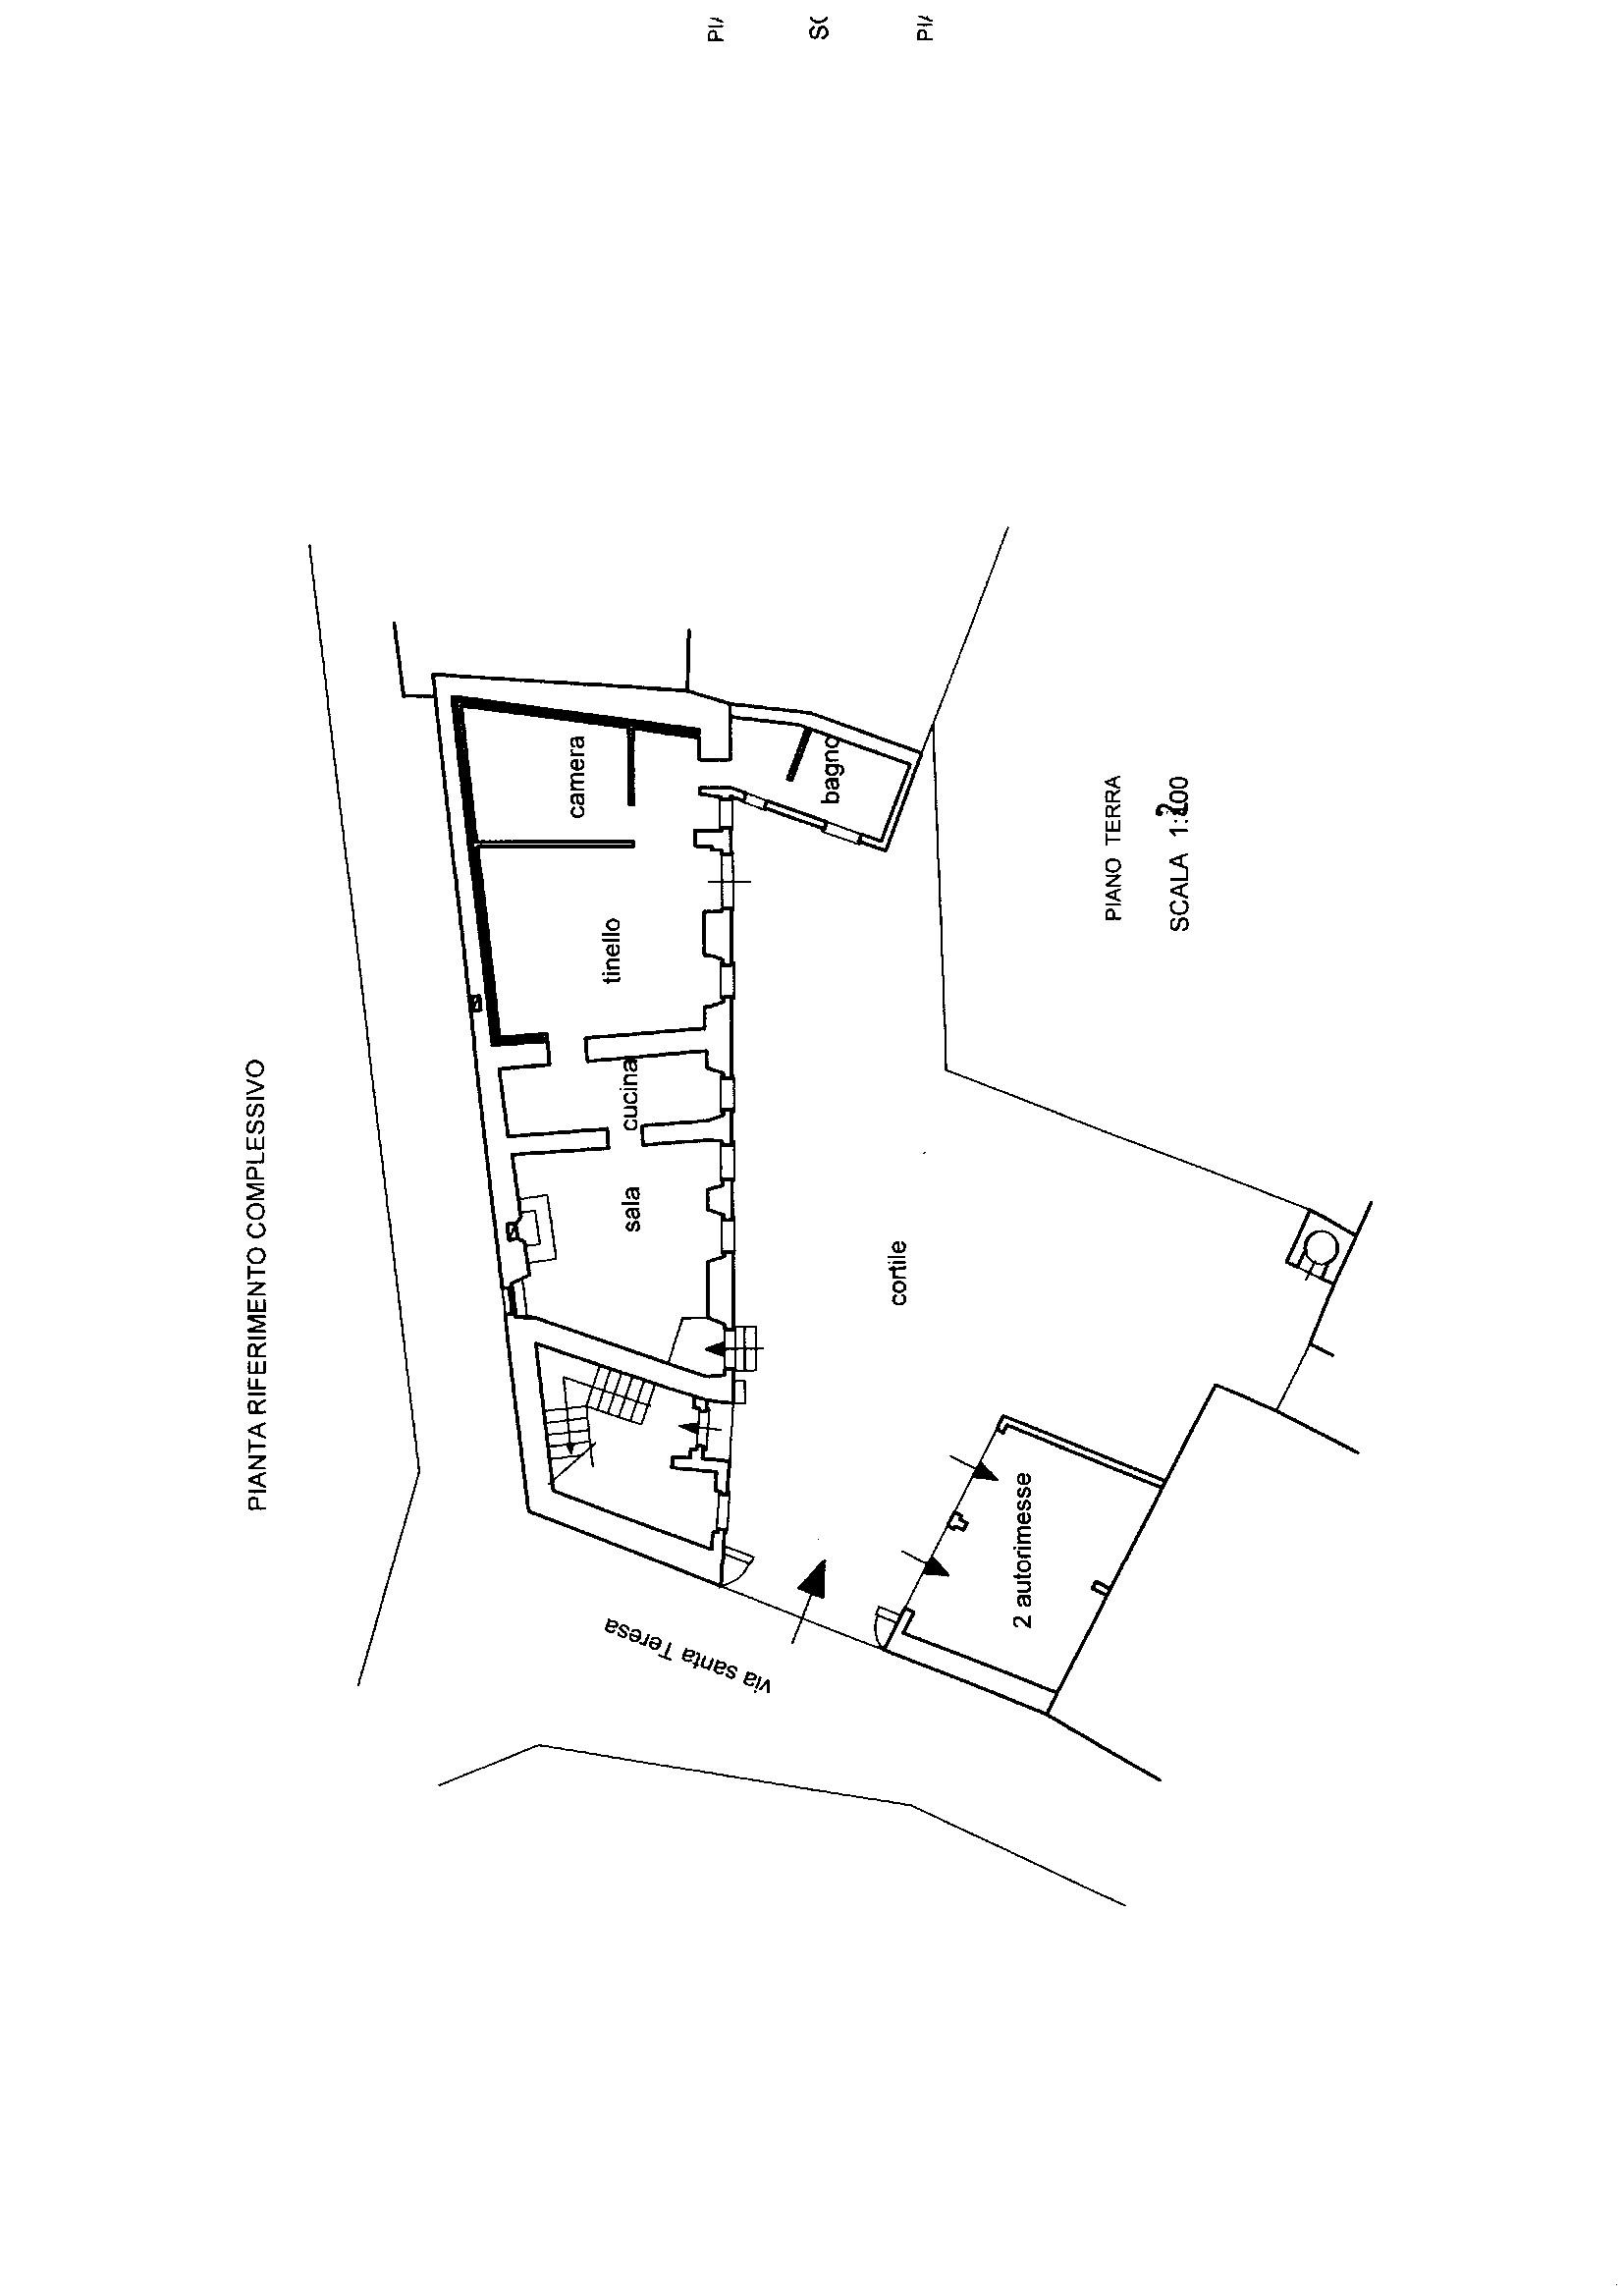 West Village Cary Tamarkin Deborah Berke Renovated Condo additionally 63824519694350380 besides 42597395 likewise Index furthermore maisonlacerisaie. on renovated farmhouse bathroom